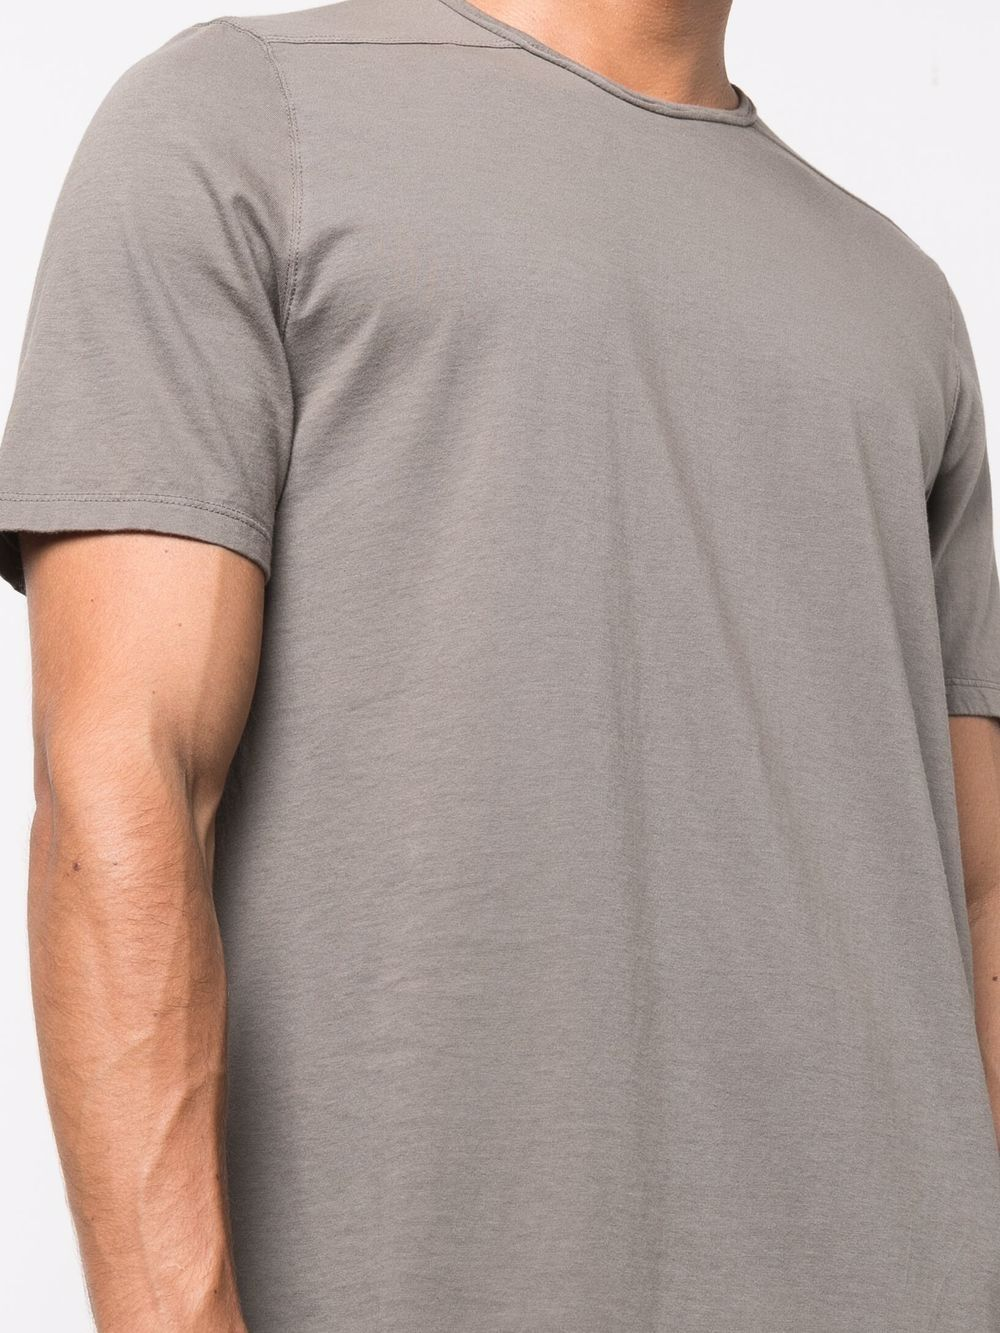 t-shirt level t uomo grigia in cotone bio RICK OWENS DRKSHDW   T-shirt   DU02A3250 RN34